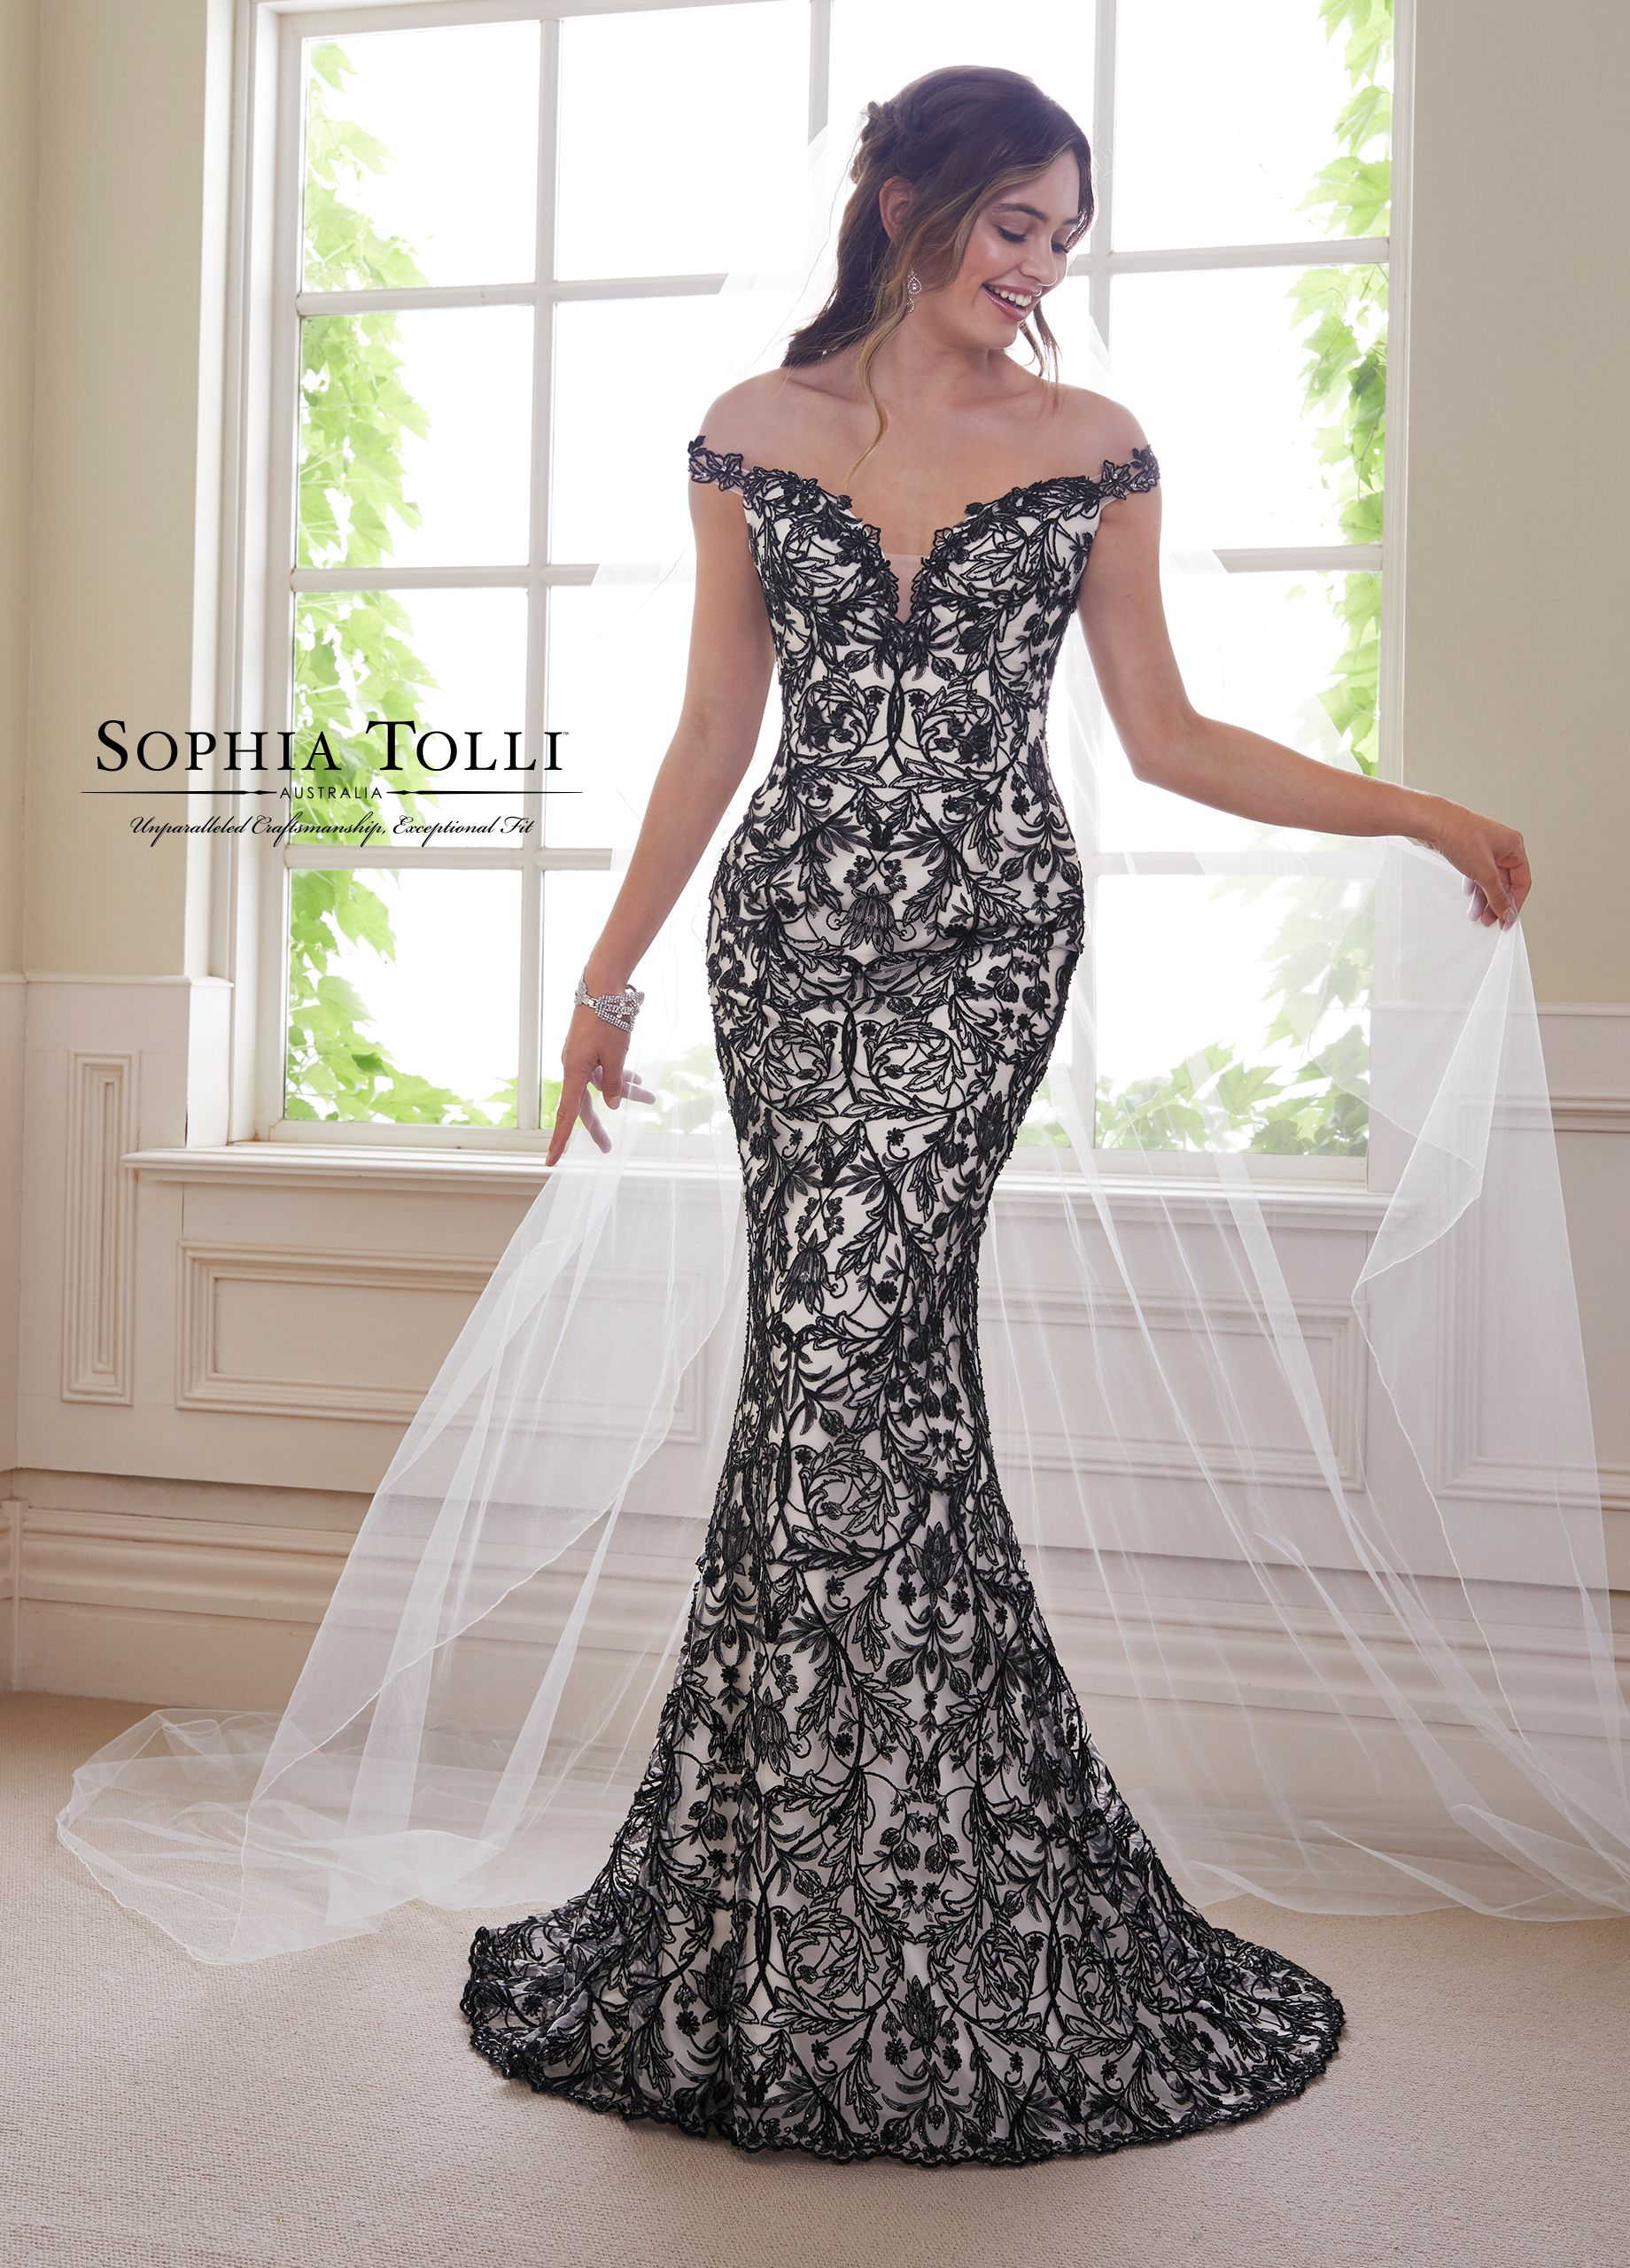 2Piece Wedding Dress Set with Black Lace Y21810B